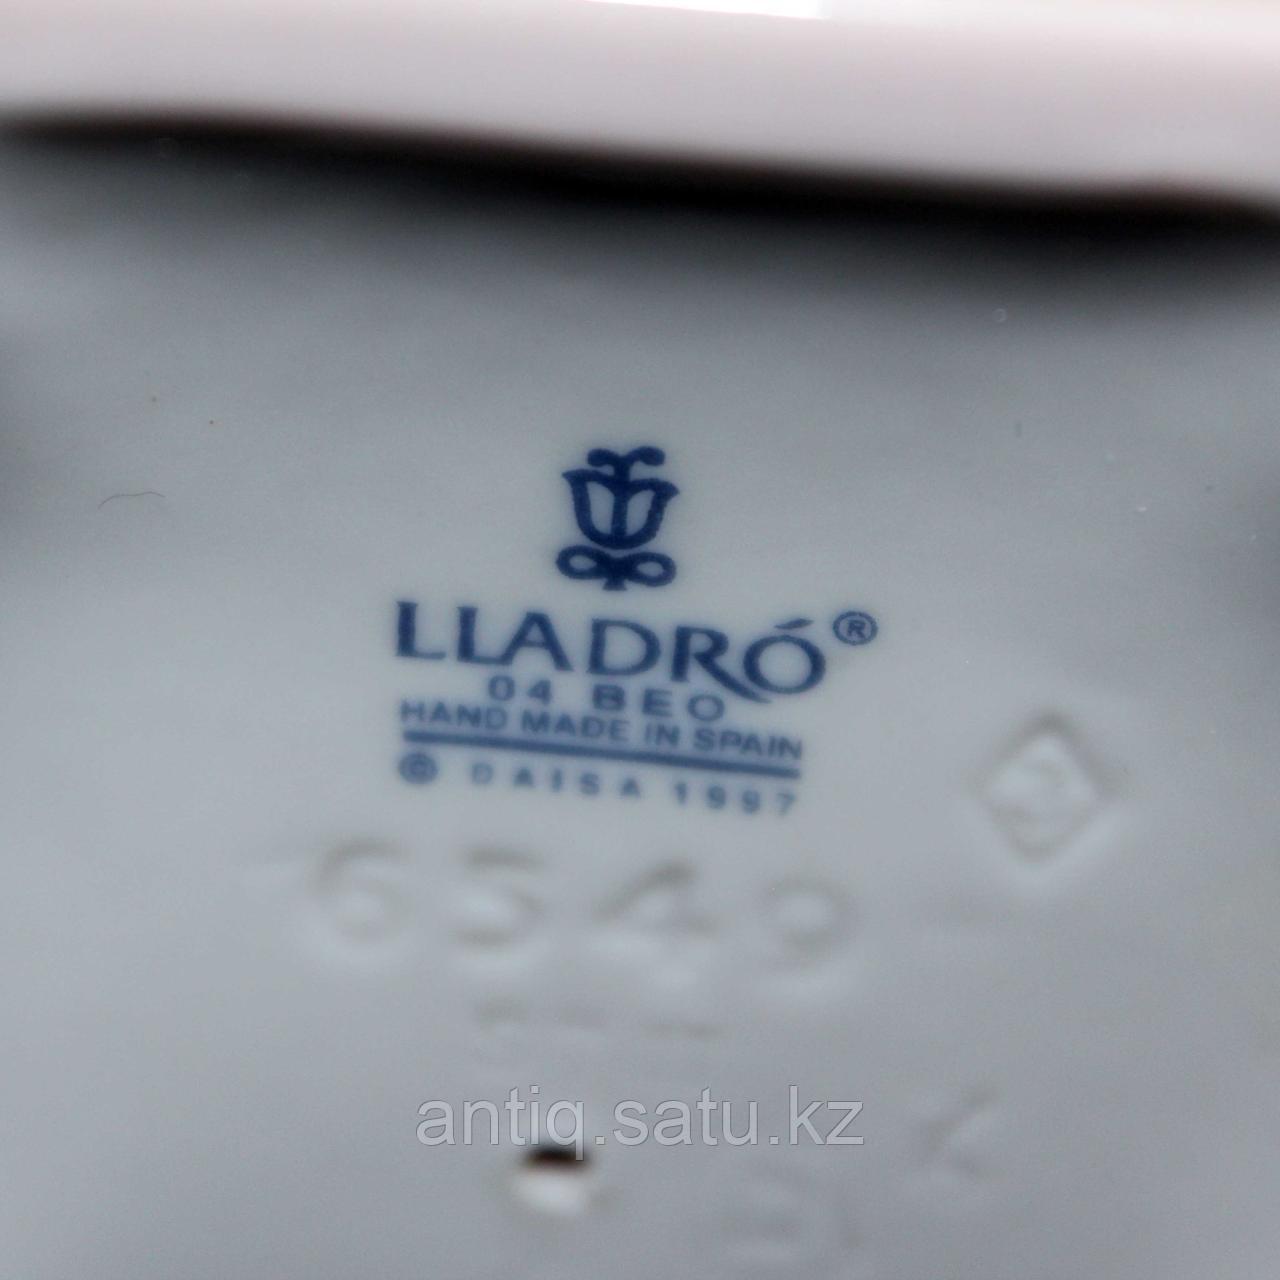 Фарфоровая мануфактура Lladro - фото 5